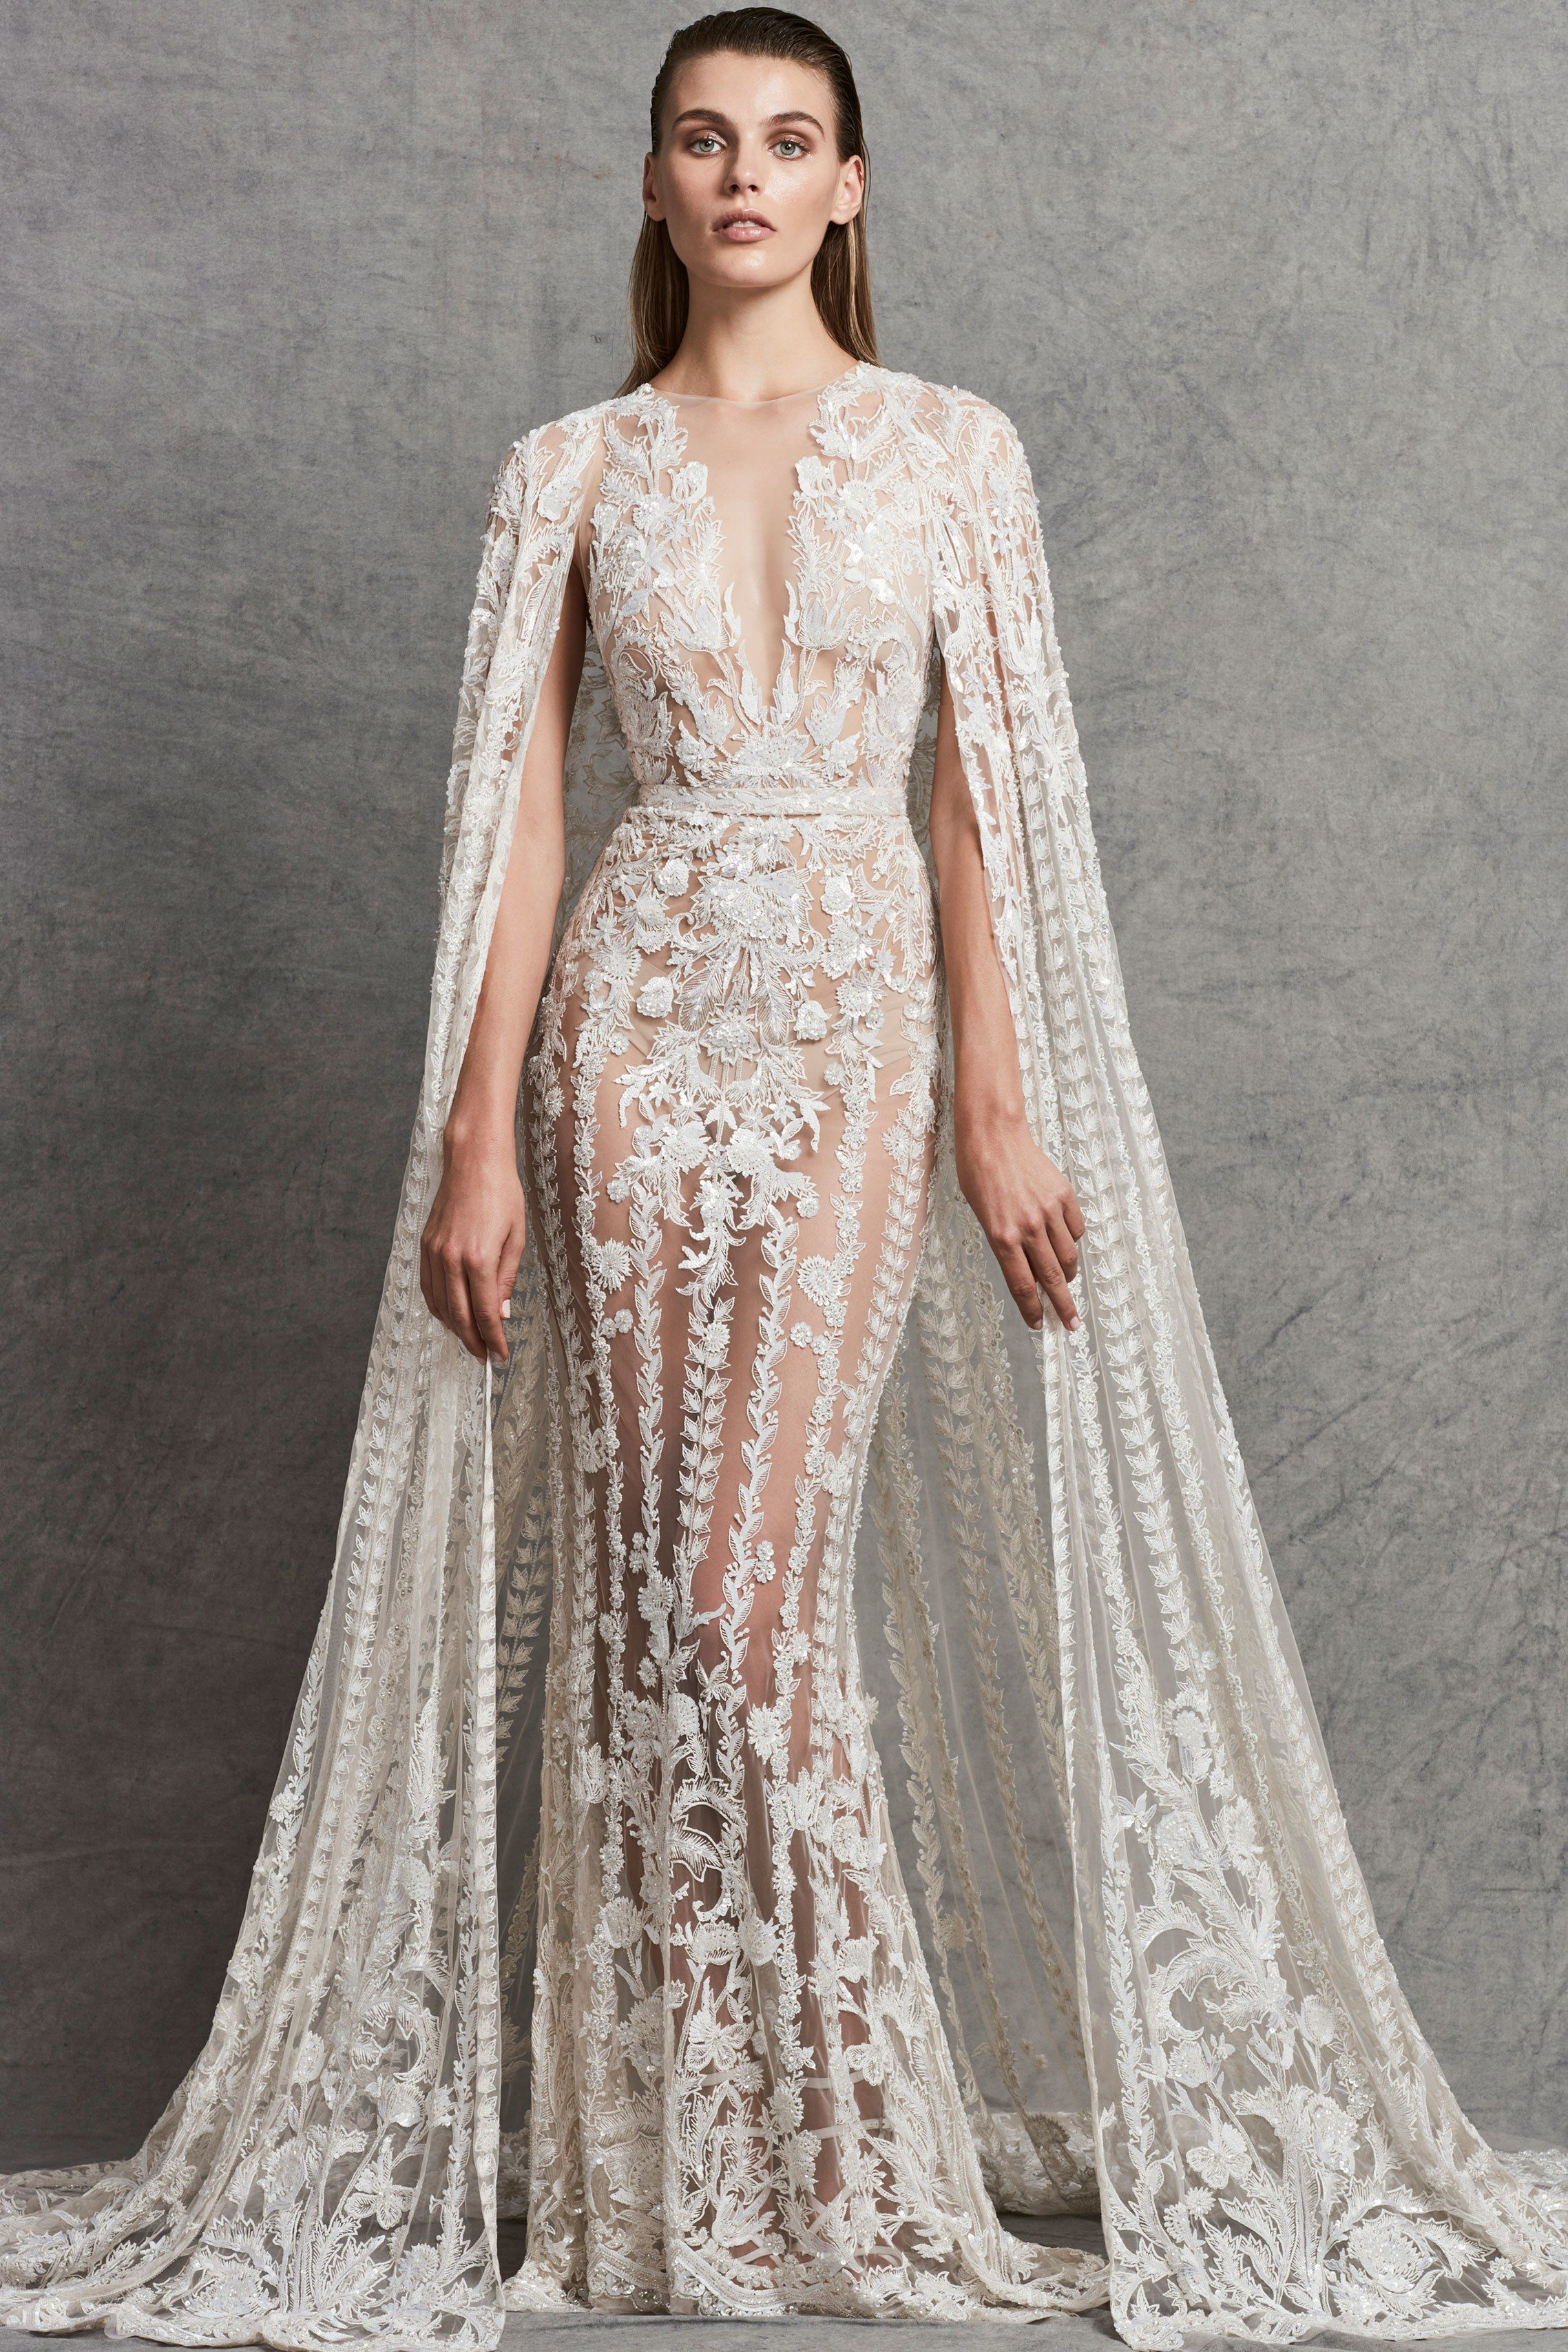 Zuhair Murad Bridal Fall 2018 Fashion Show   Wedding decorations ...